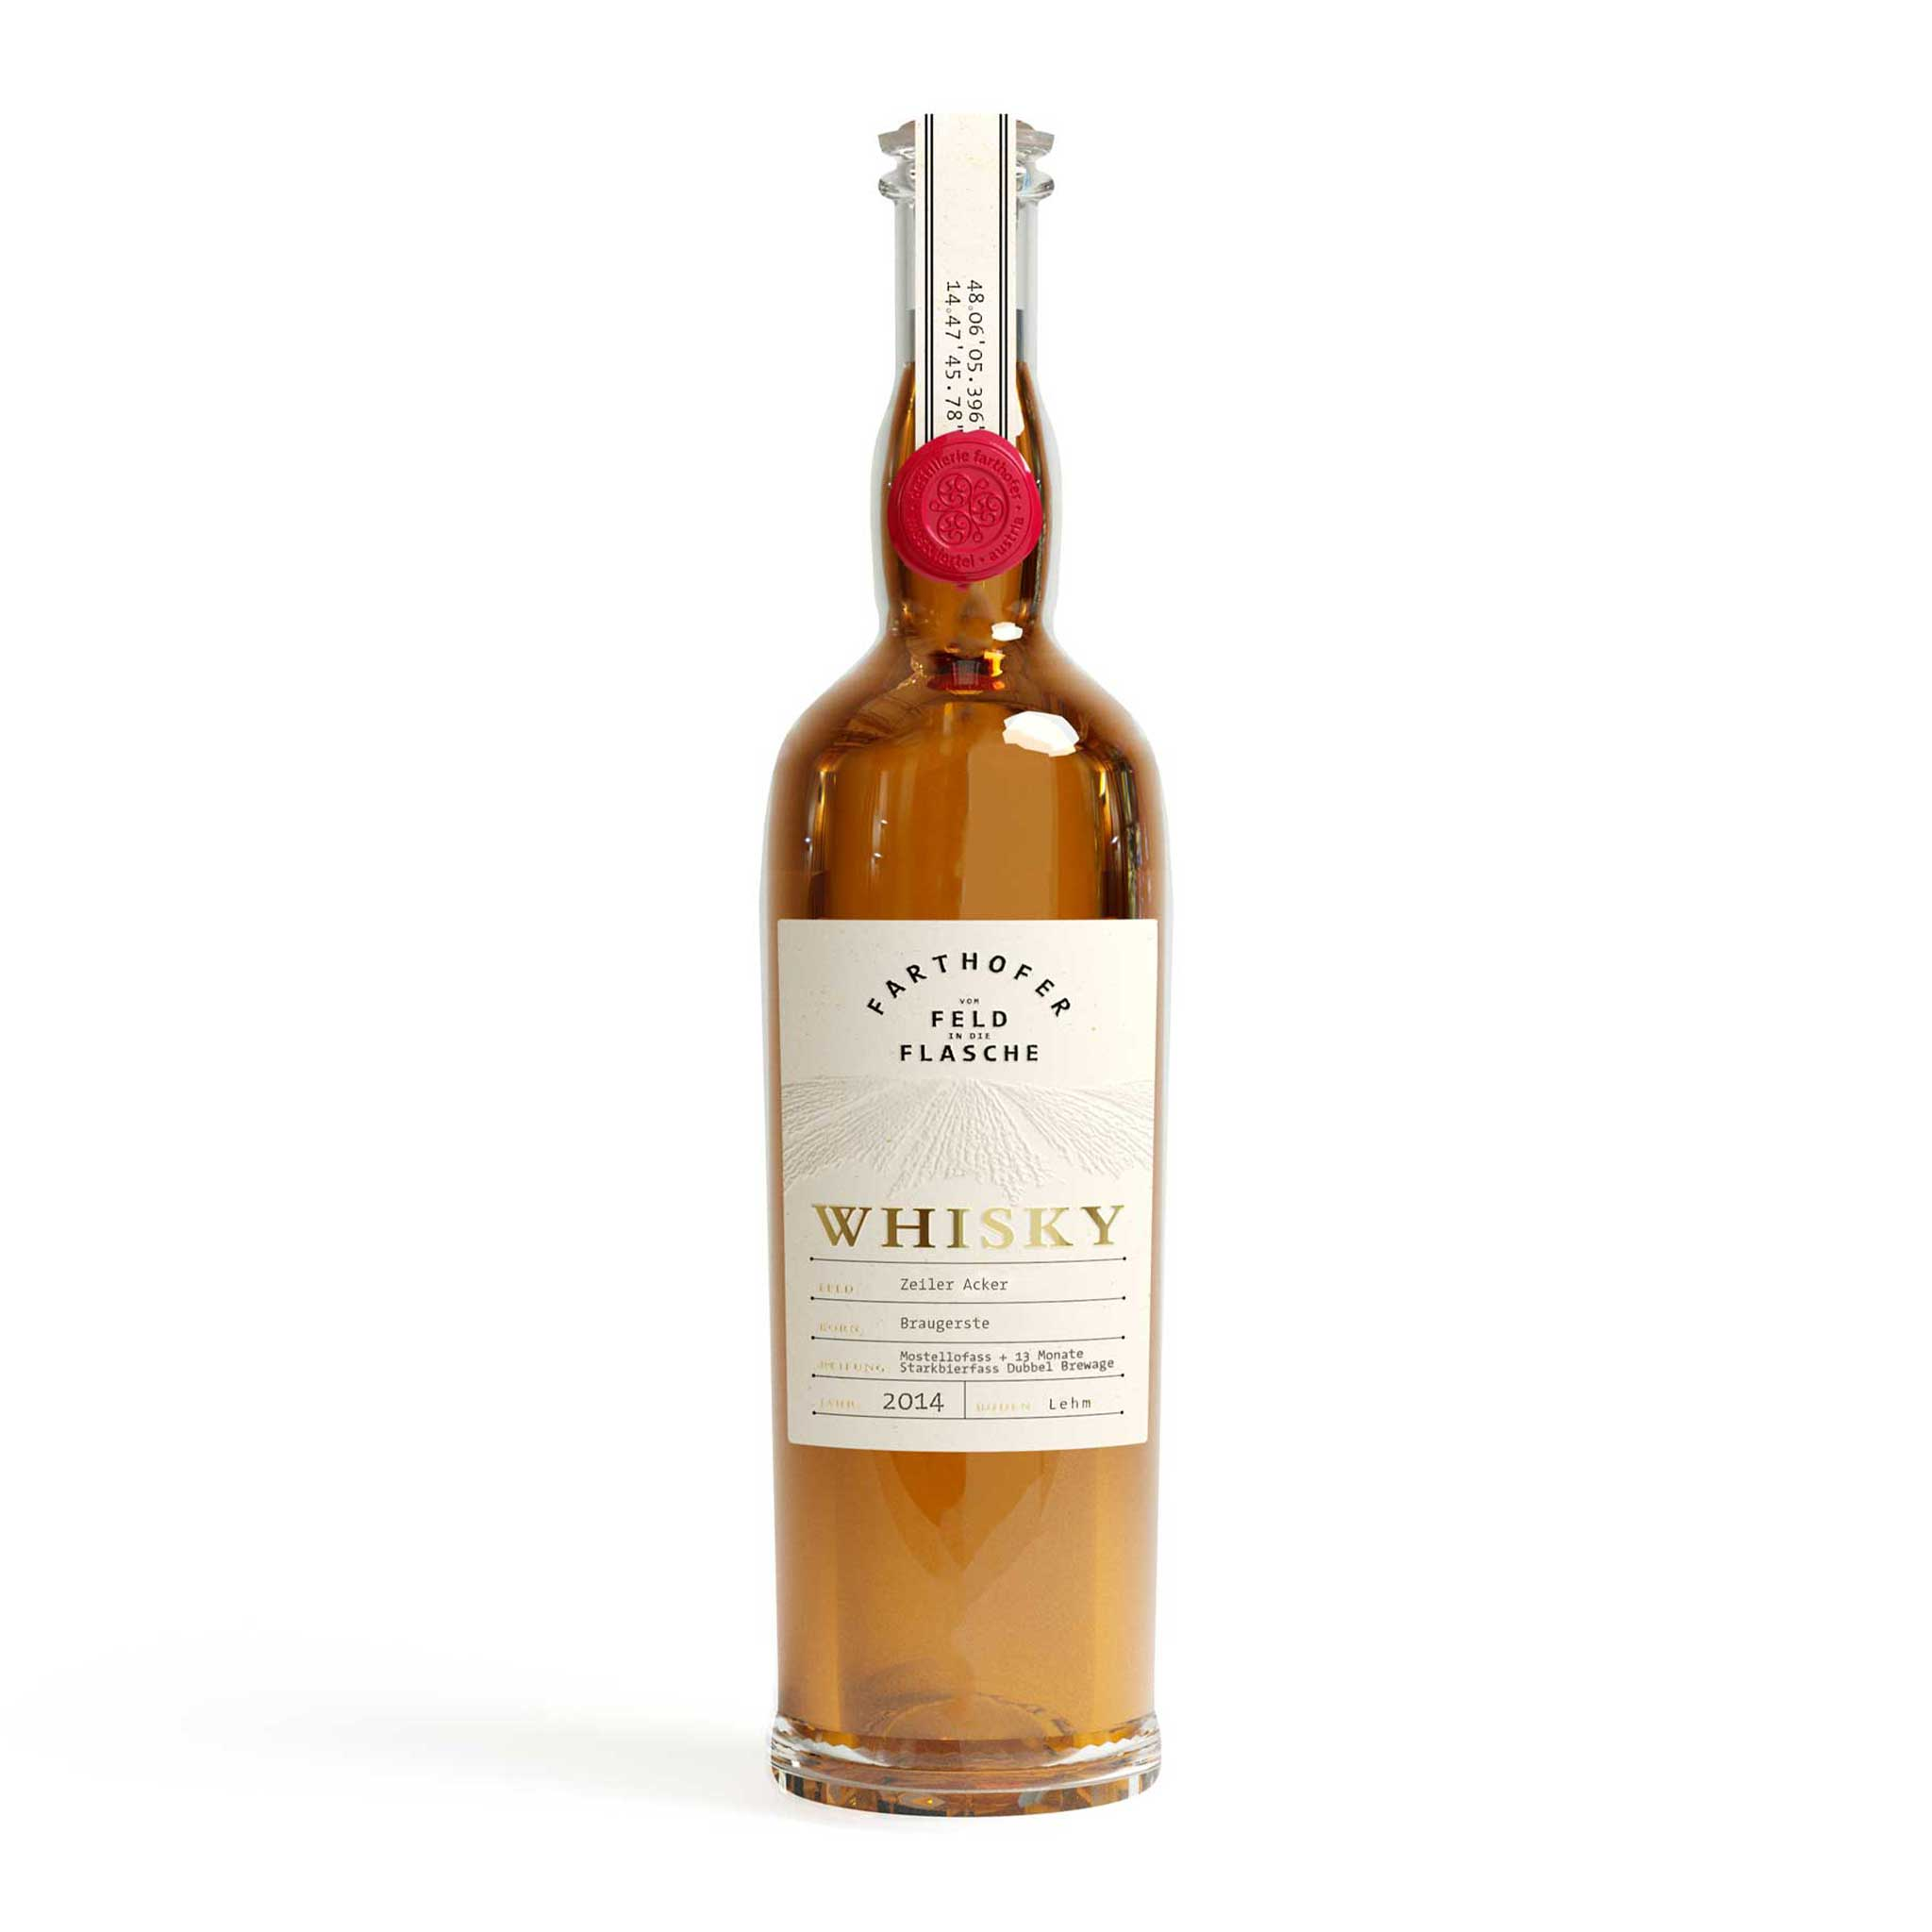 Produktfoto Whisky Braugerste 2014 Mostellofass Starkbierfass (40 % vol) - Destillerie Farthofer